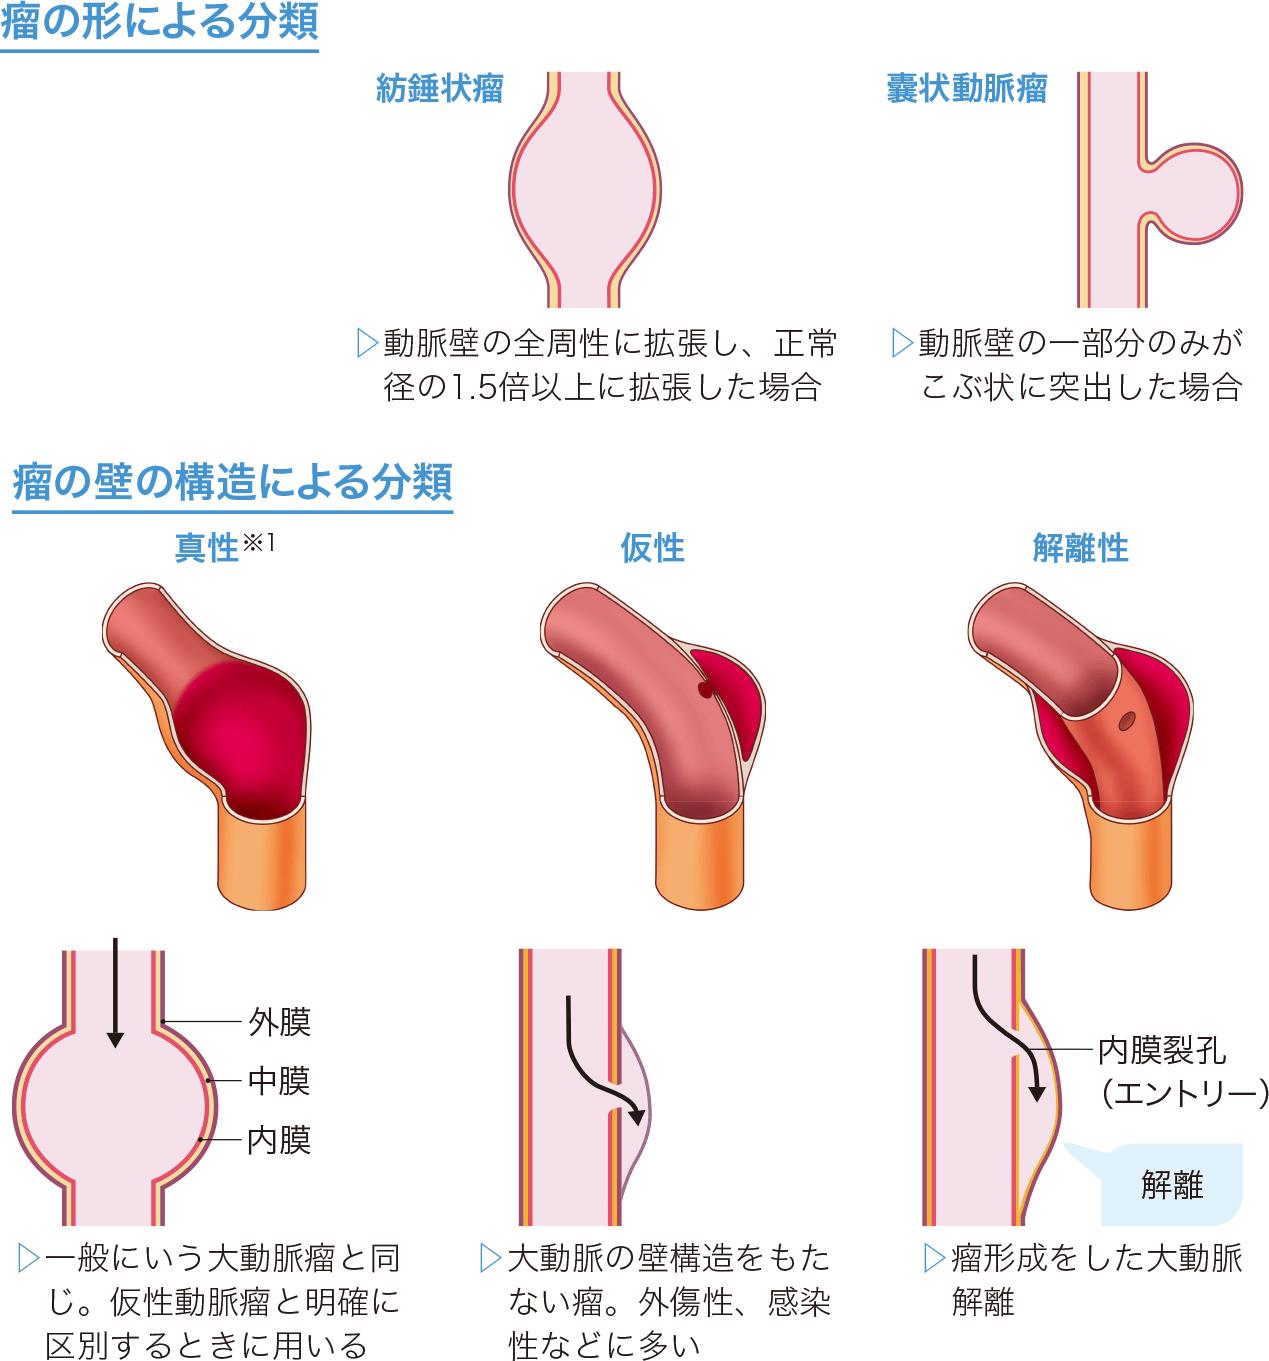 大動脈瘤の分類